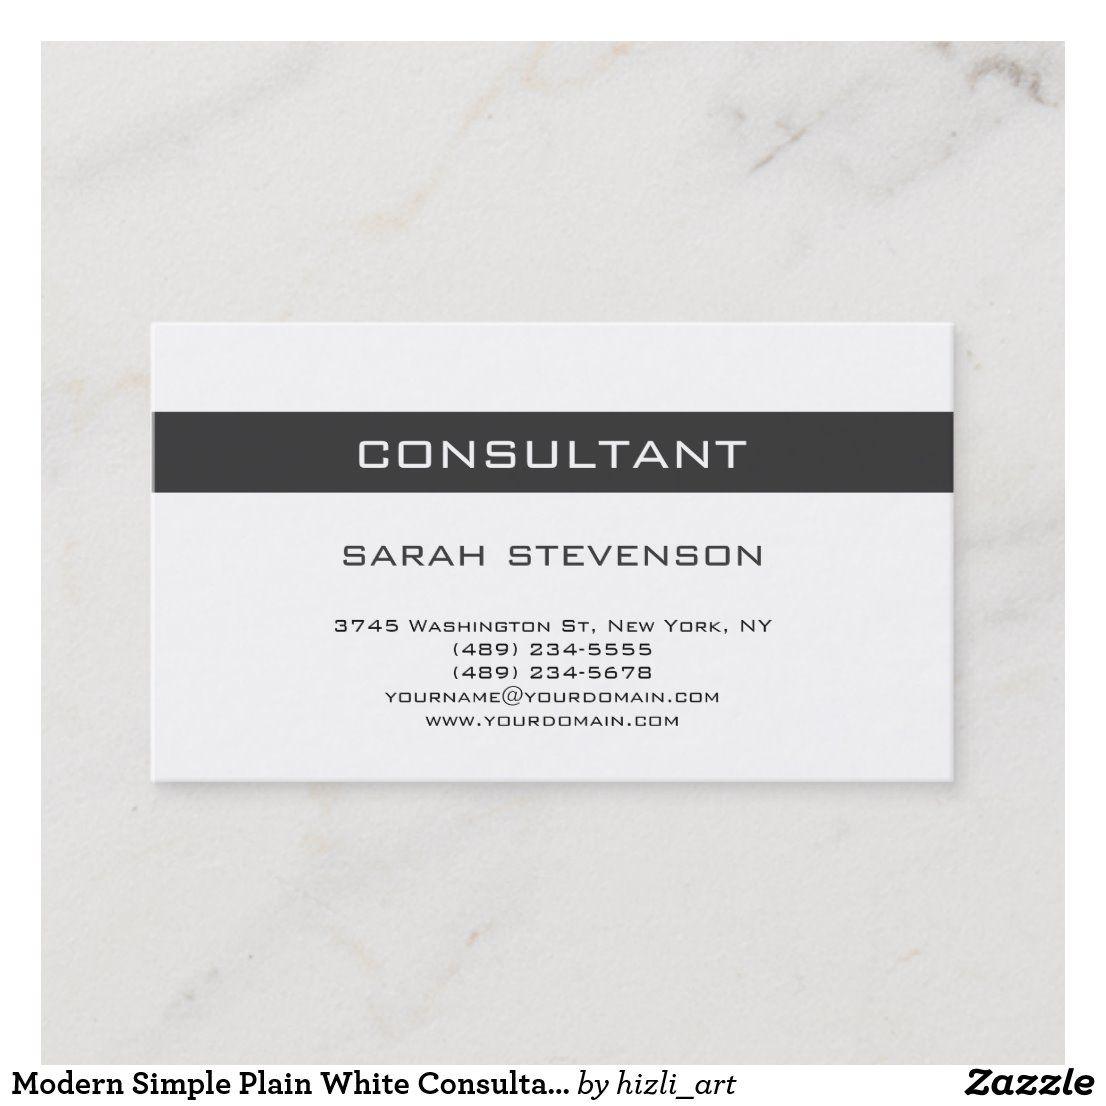 Modern Simple Plain White Consultant Business Card Zazzle Com Consultant Business Simple Business Cards Business Card Modern